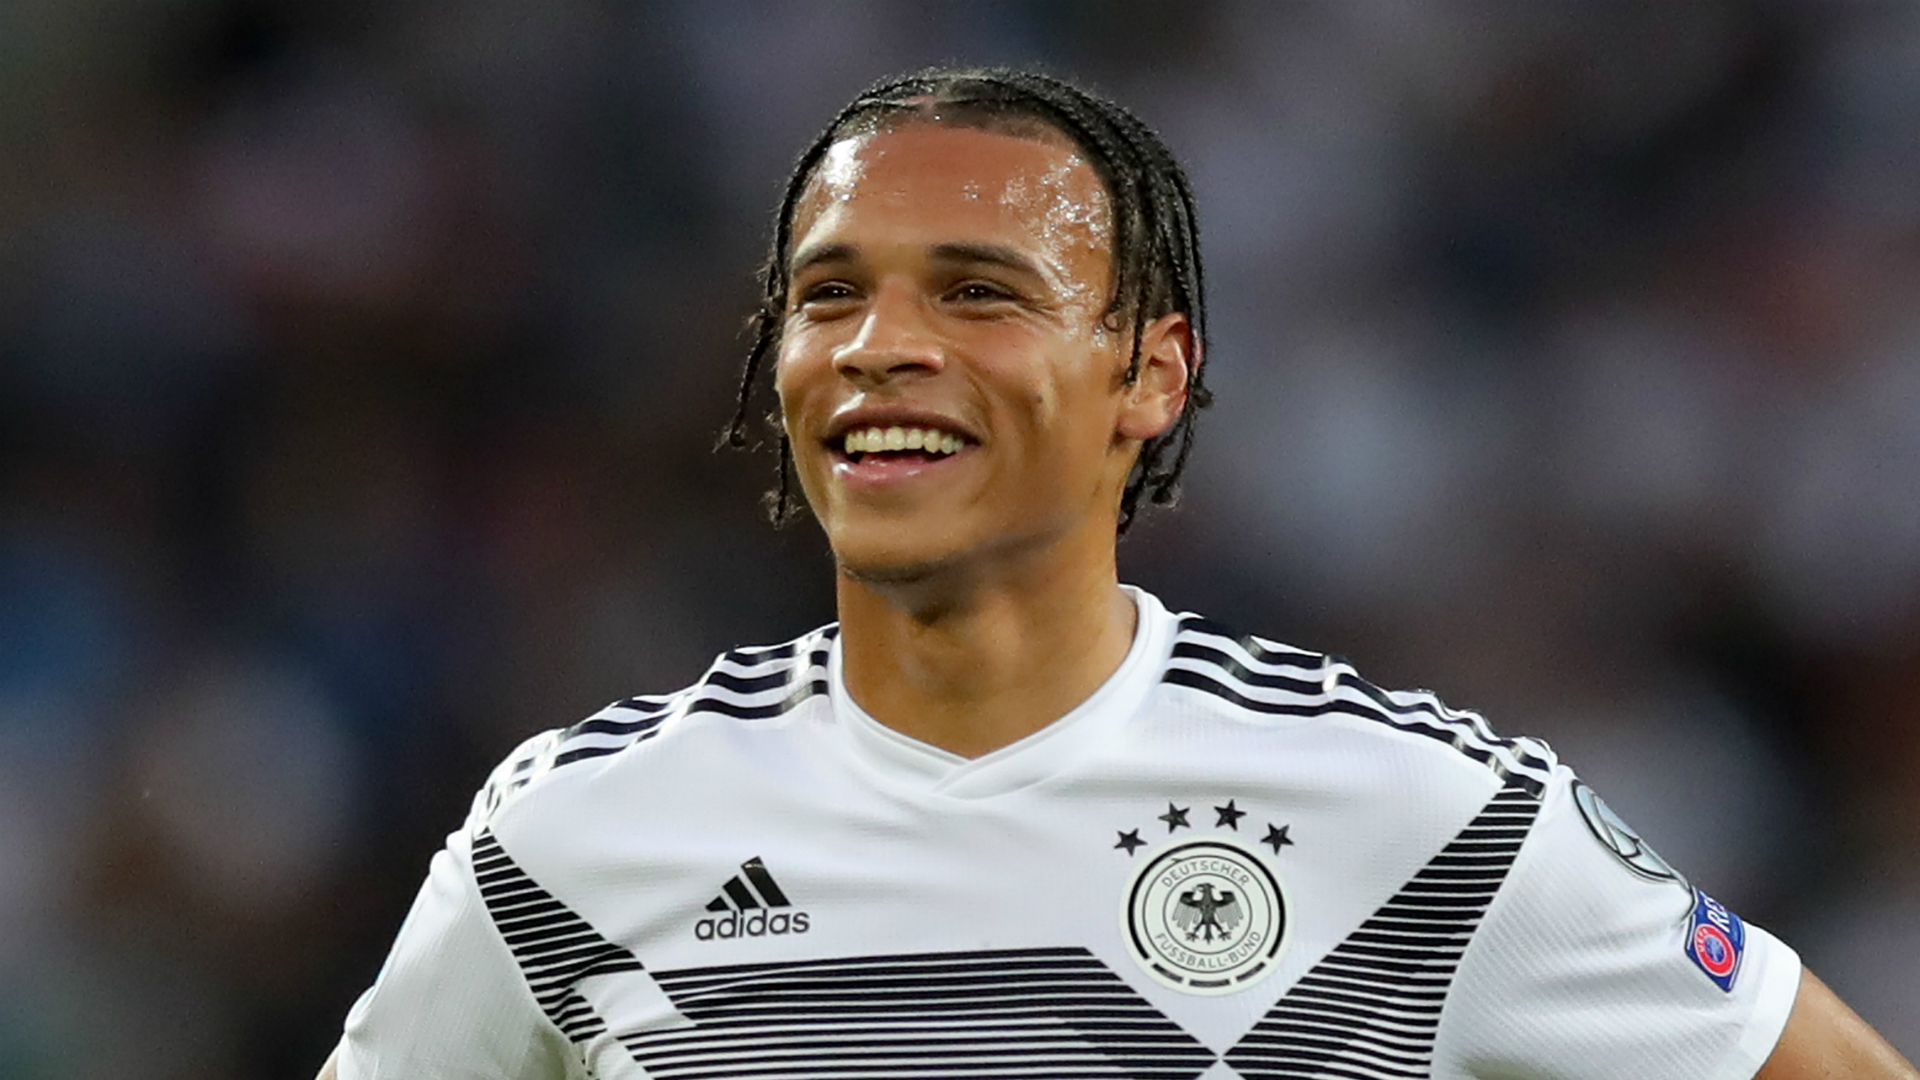 Hans-Joachim Watzke of Borussia Dortmund says it would be good for the Bundesliga if rivals Bayern Munich signed Germany star Leroy Sane.